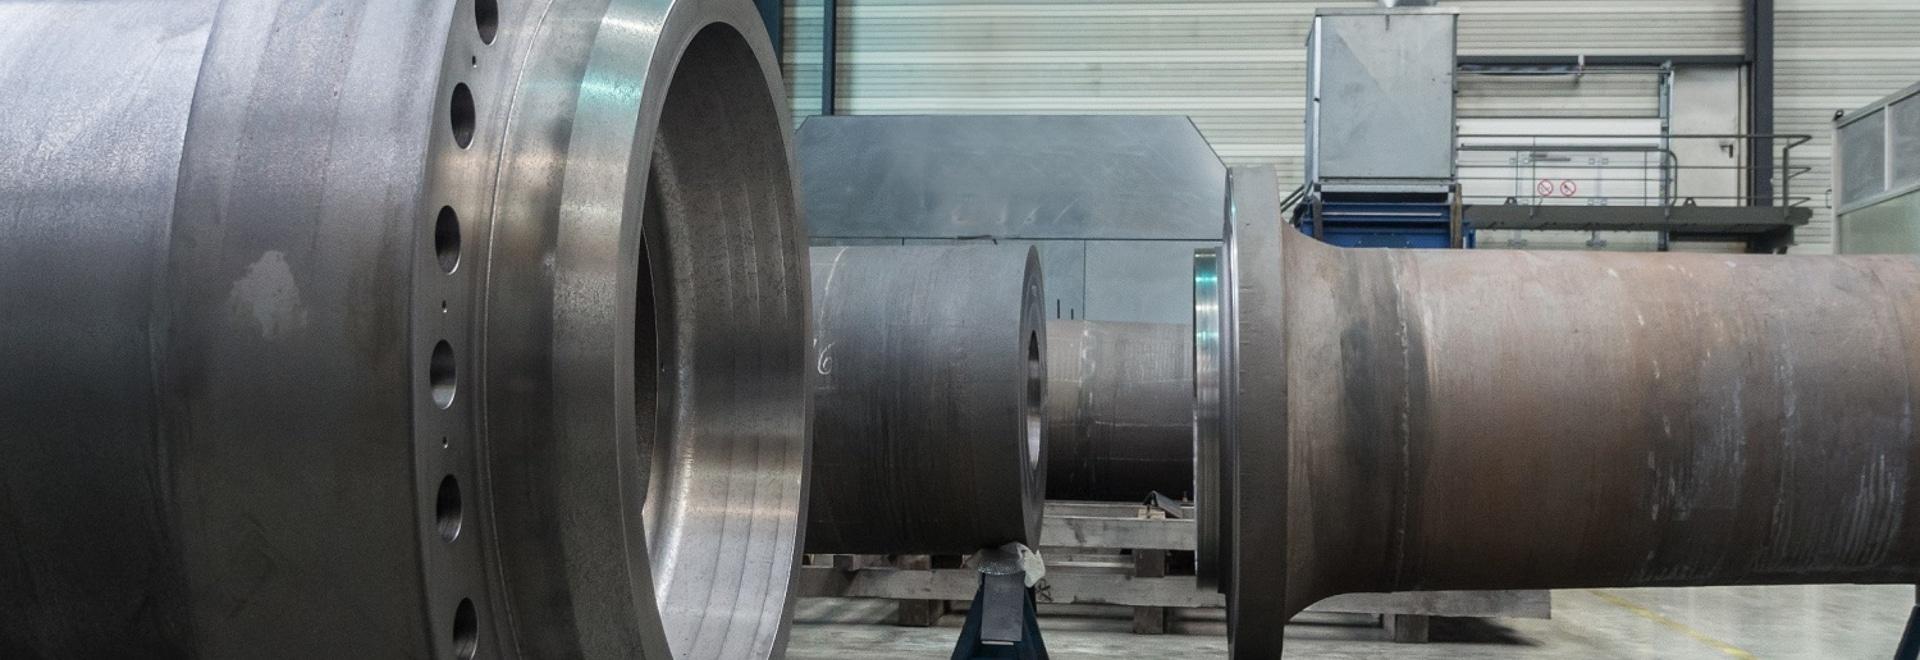 Lightening the load in heavy engineering